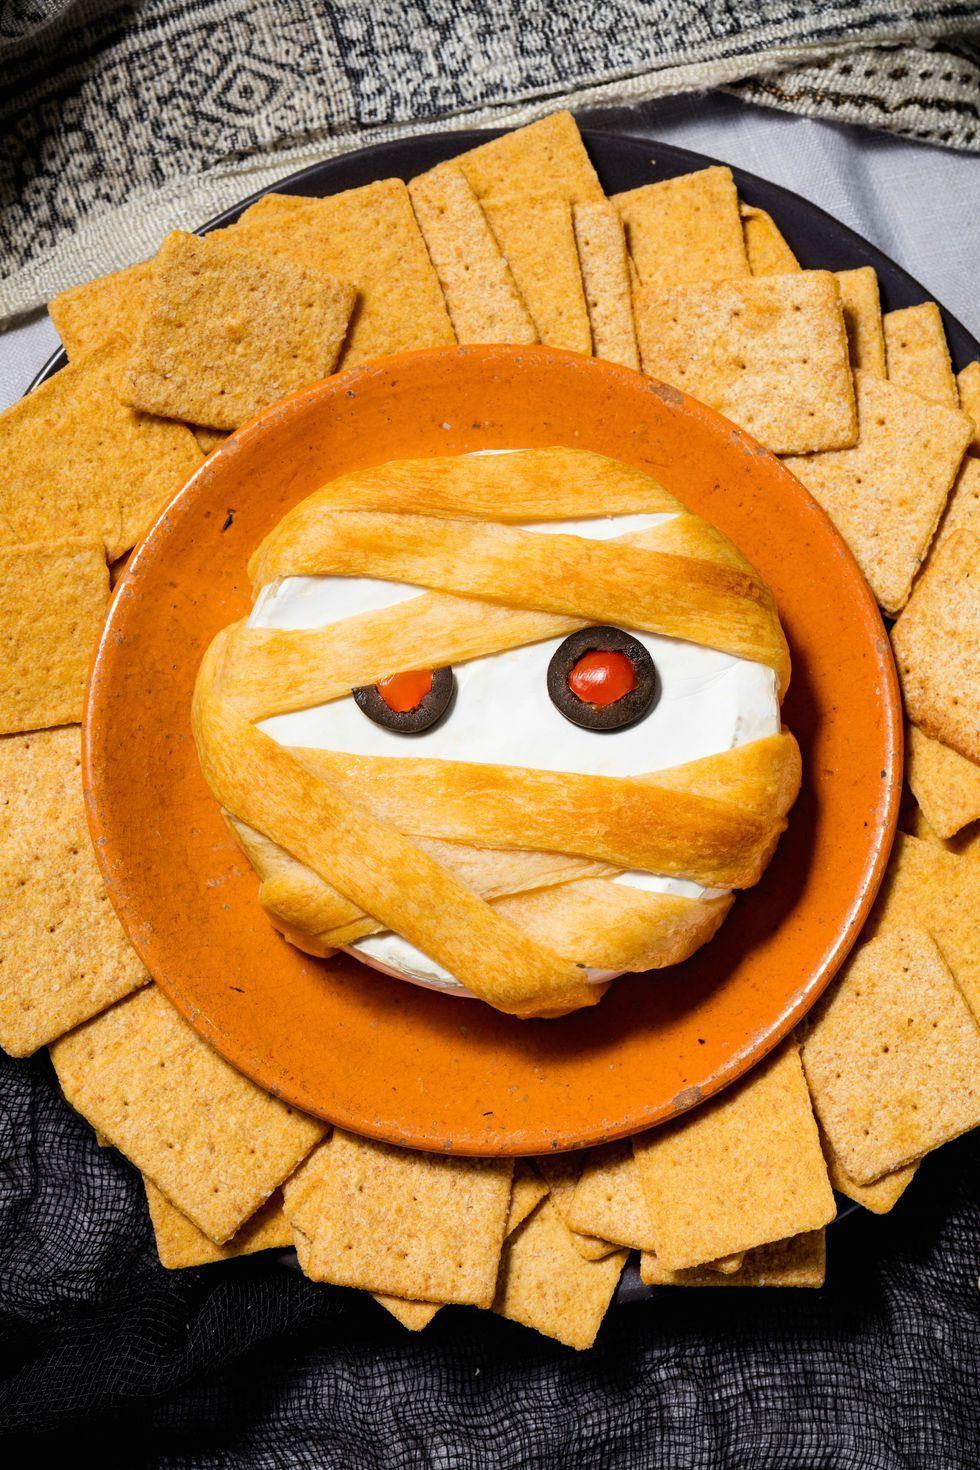 Fall Dessert Wallpaper 38 Easy Halloween Appetizers Recipes Amp Ideas For